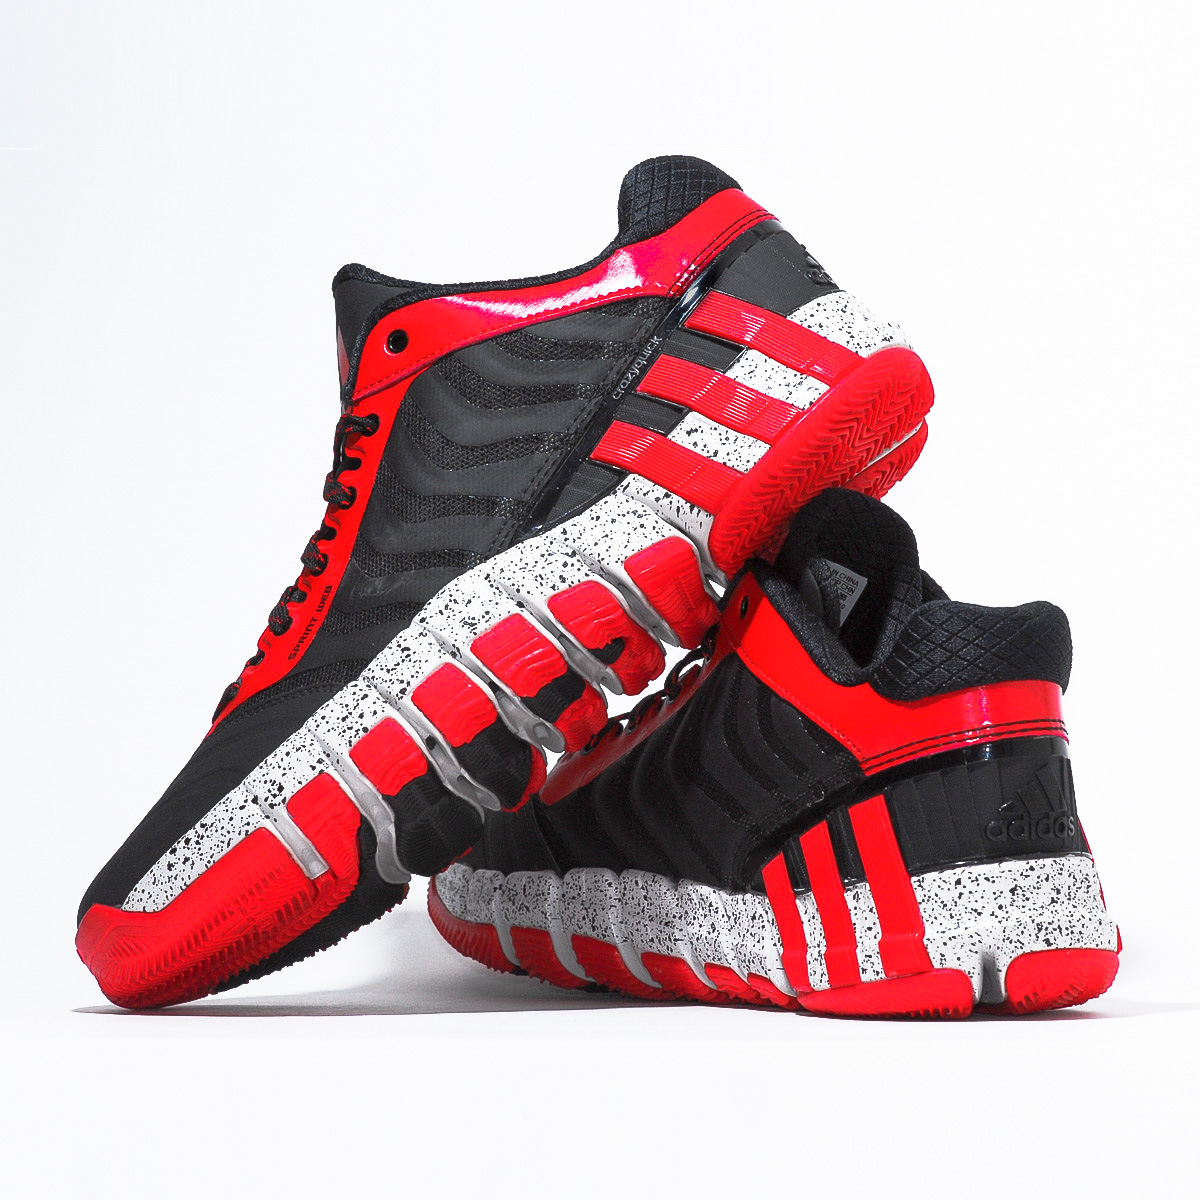 adidas-jl7-quickvsfast-3